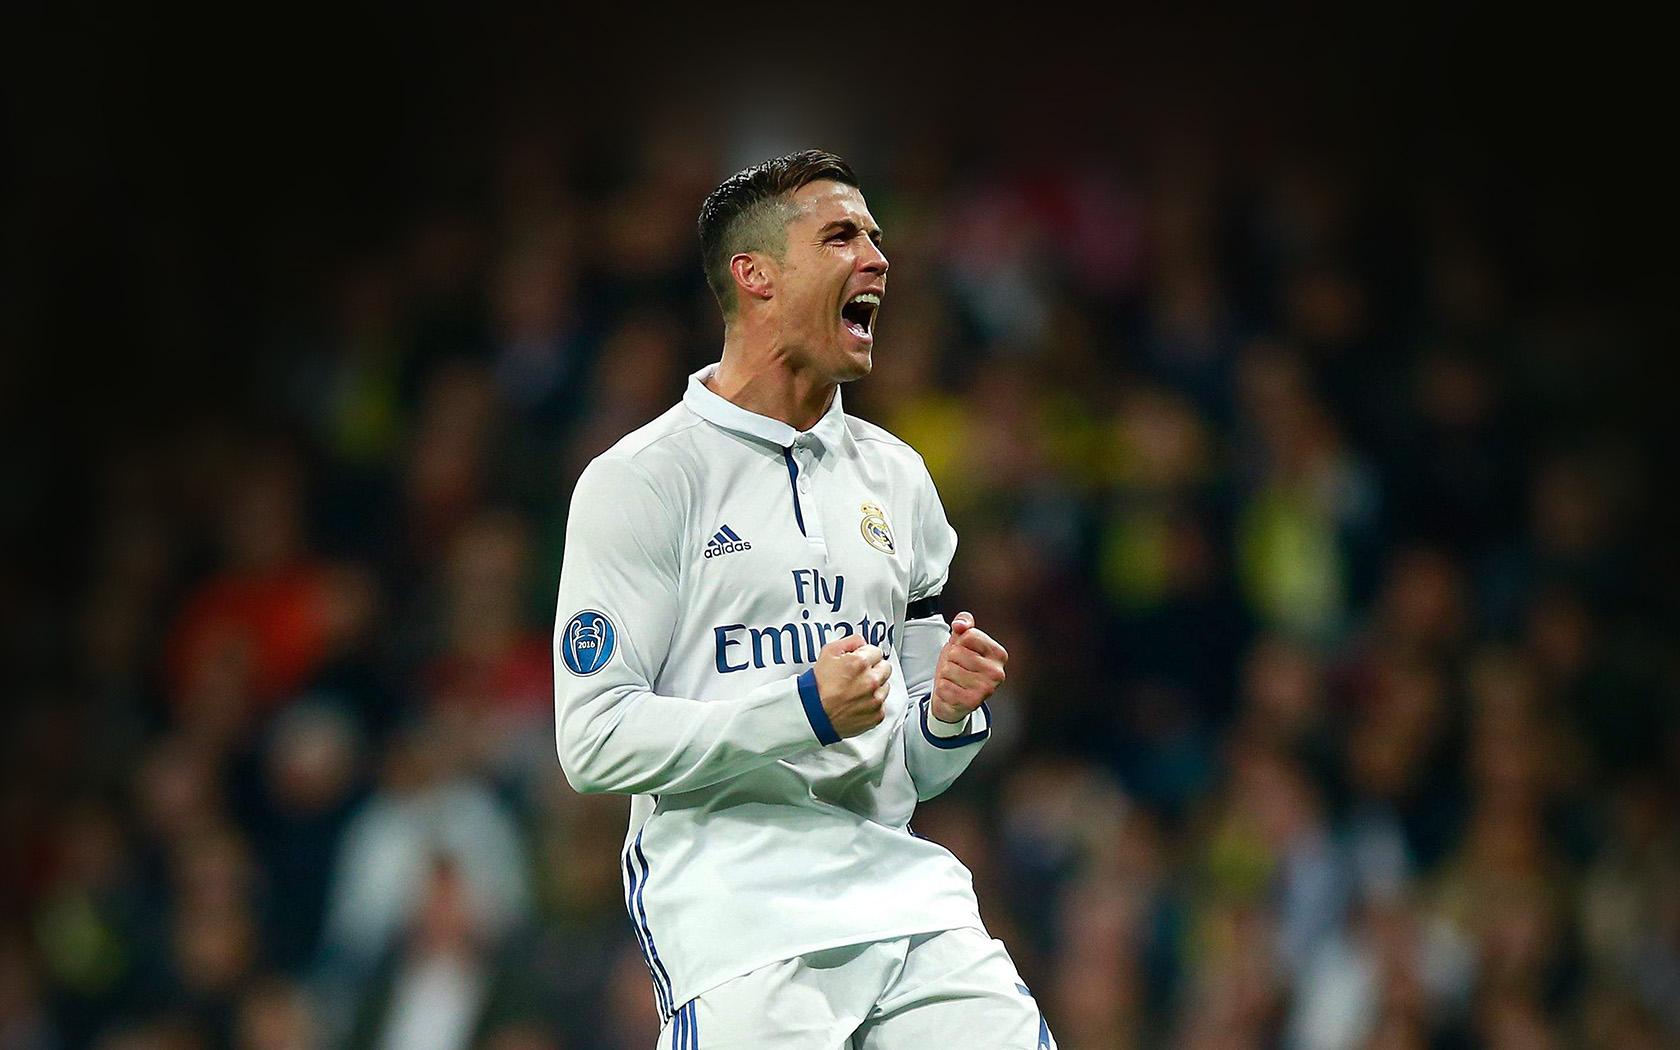 Real Madrid Desktop Wallpaper Hd Hm22 C Ronaldo Soccer Real Madrid Sports Wallpaper